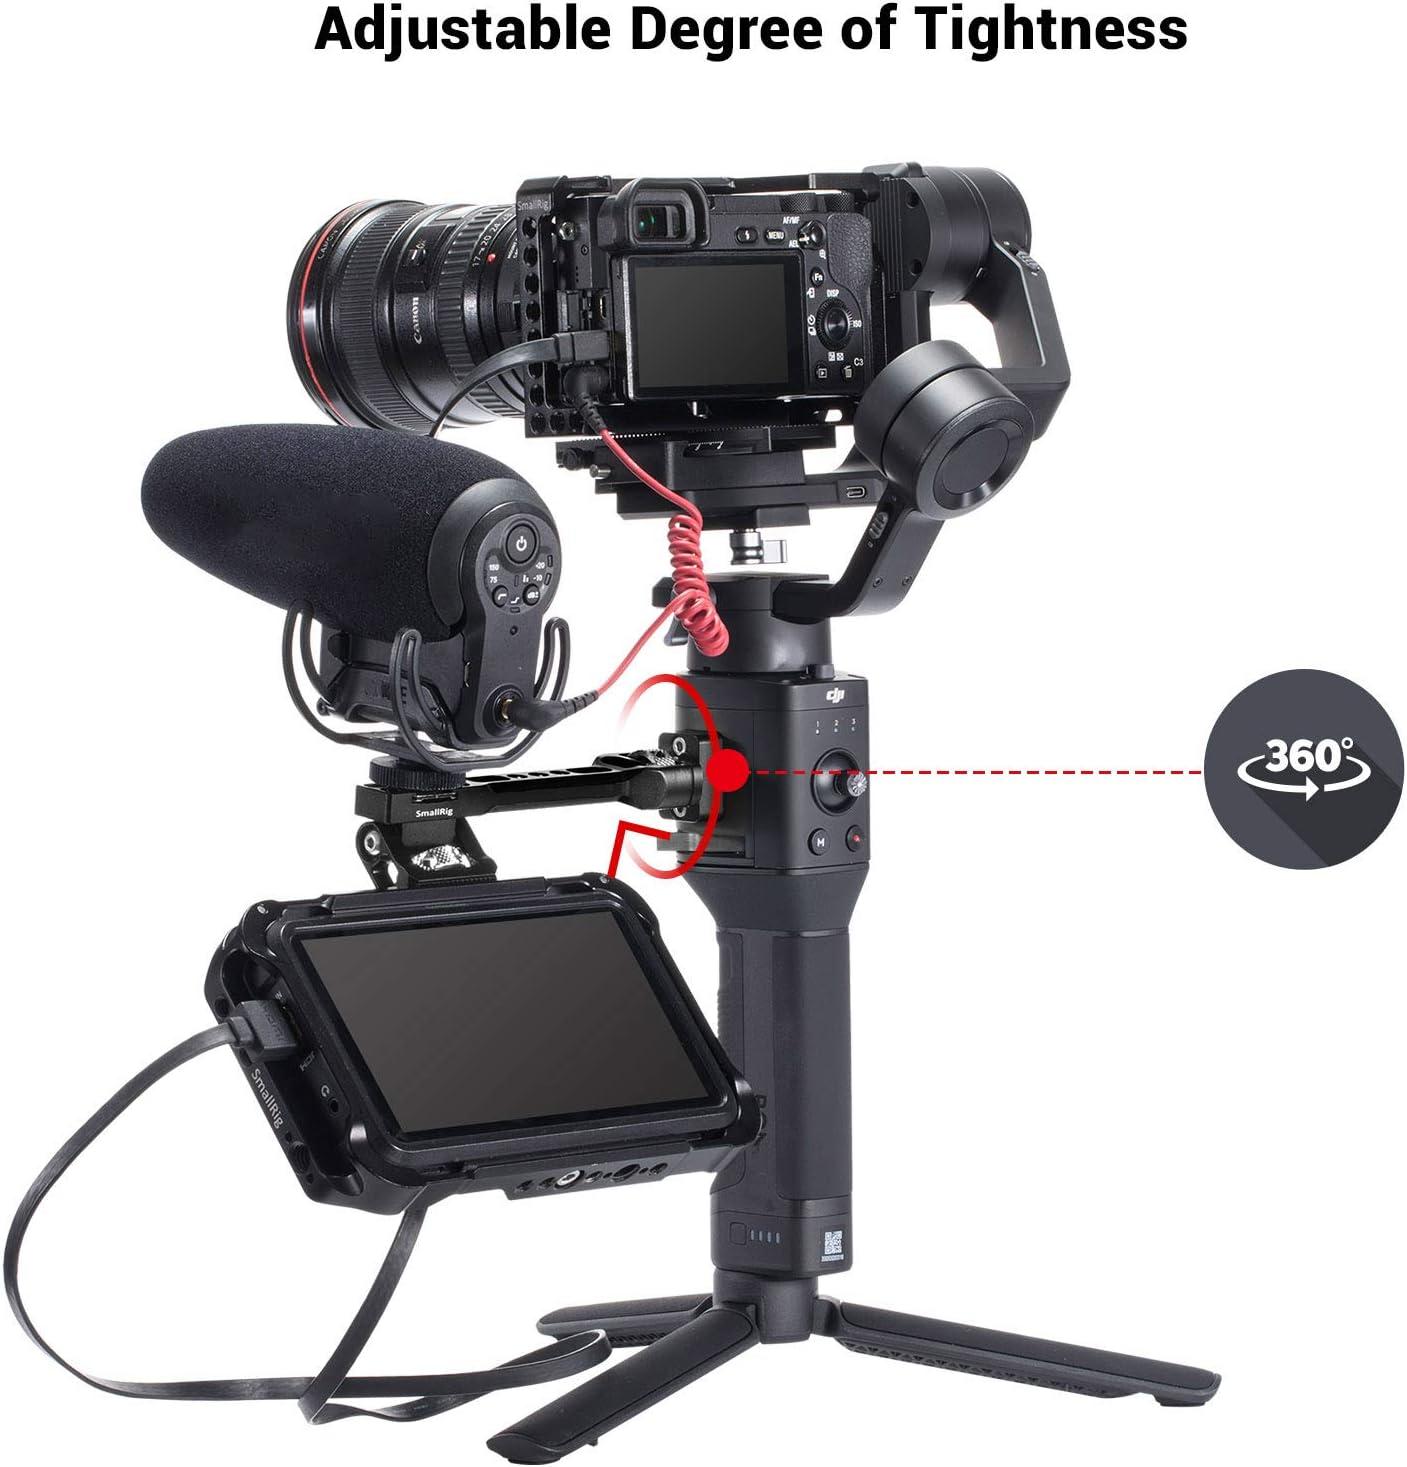 SMALLRIG Adjustable Camera Monitor Mount for DJI Ronin-S/Ronin-SC/Zhiyun Crane 3/Weebill Lab - BSE2386 : Camera & Photo